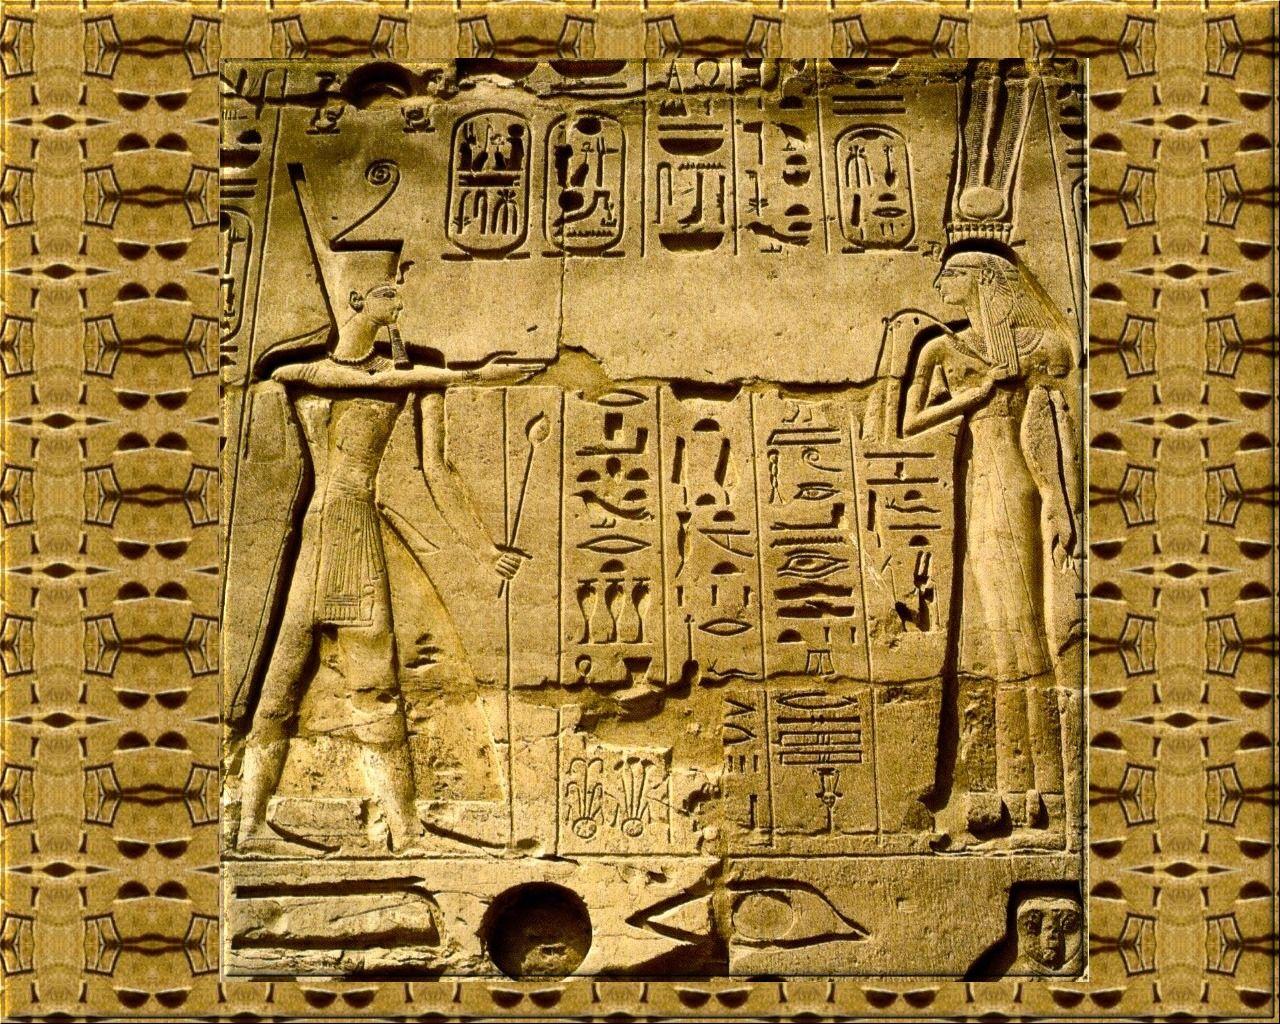 Ramesses i ancient egypt photo 37472349 fanpop for Mural egipcio